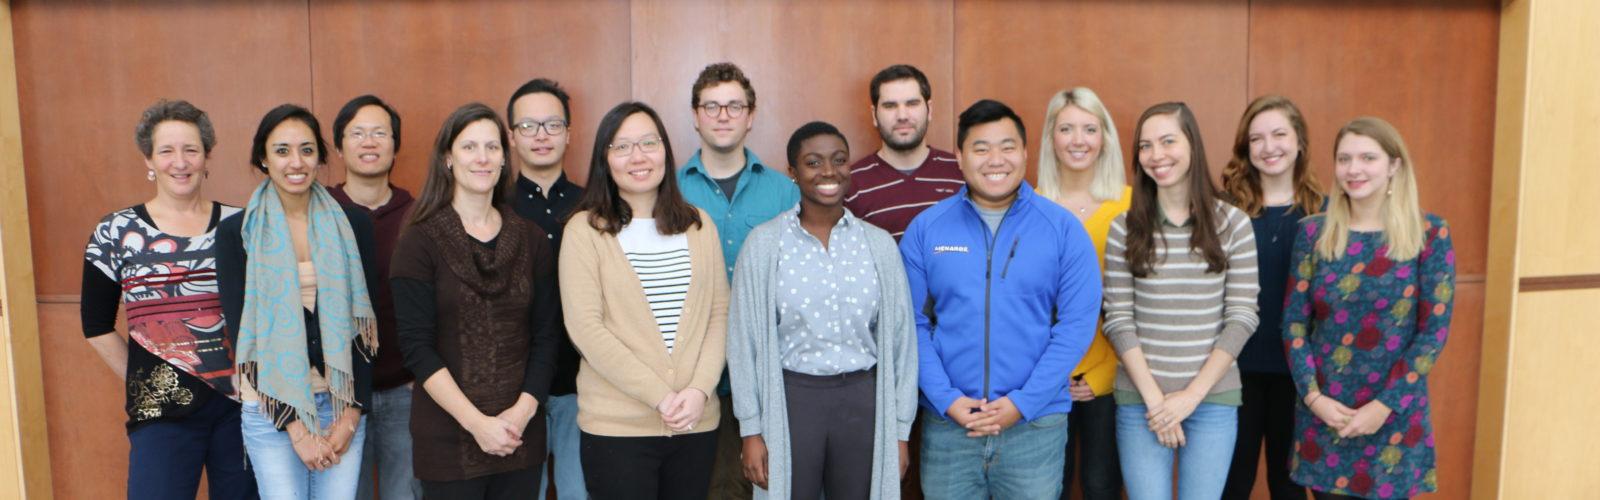 photo of binaural hearing and speech lab members